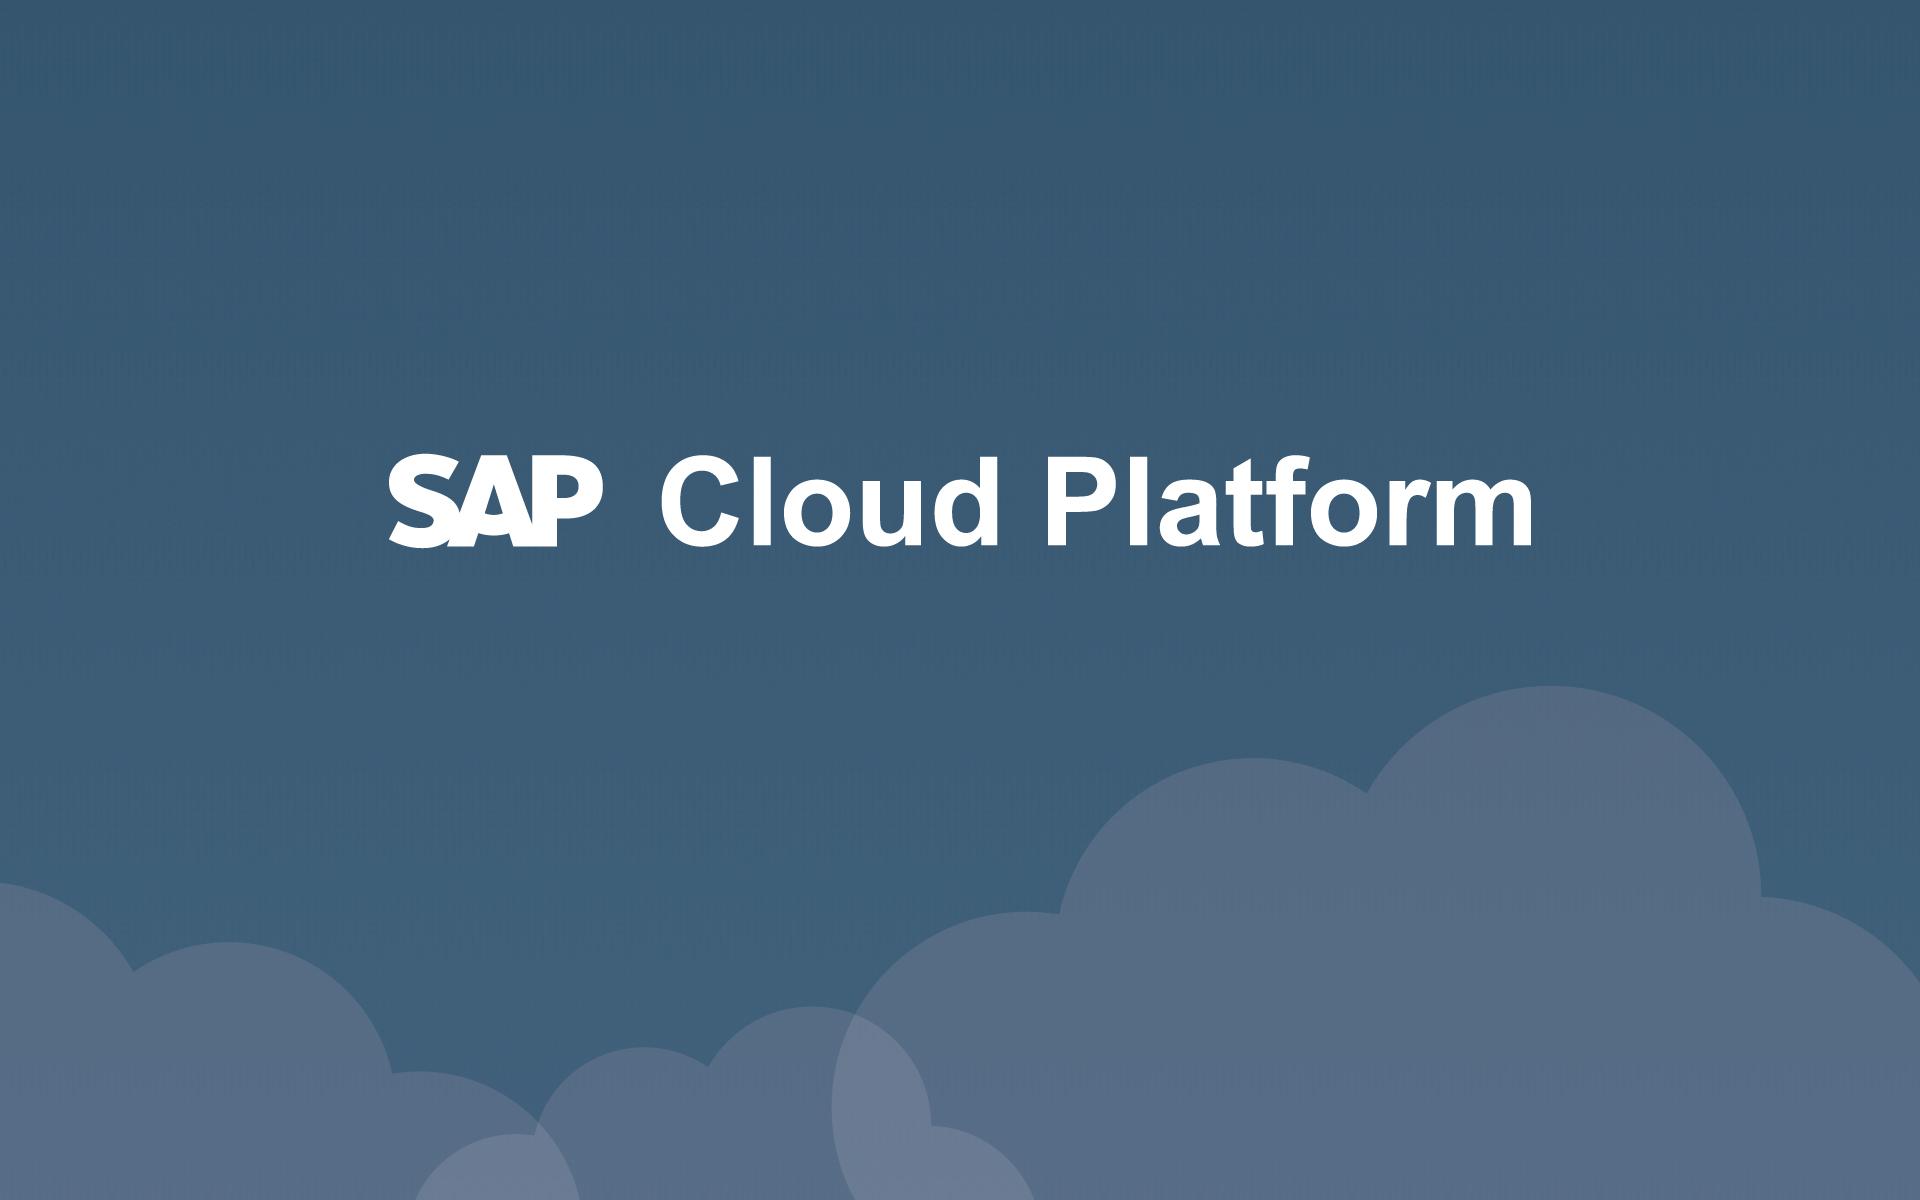 SAP Cloud Platform   PartnerEdge member   Mansystems BV 1920x1200